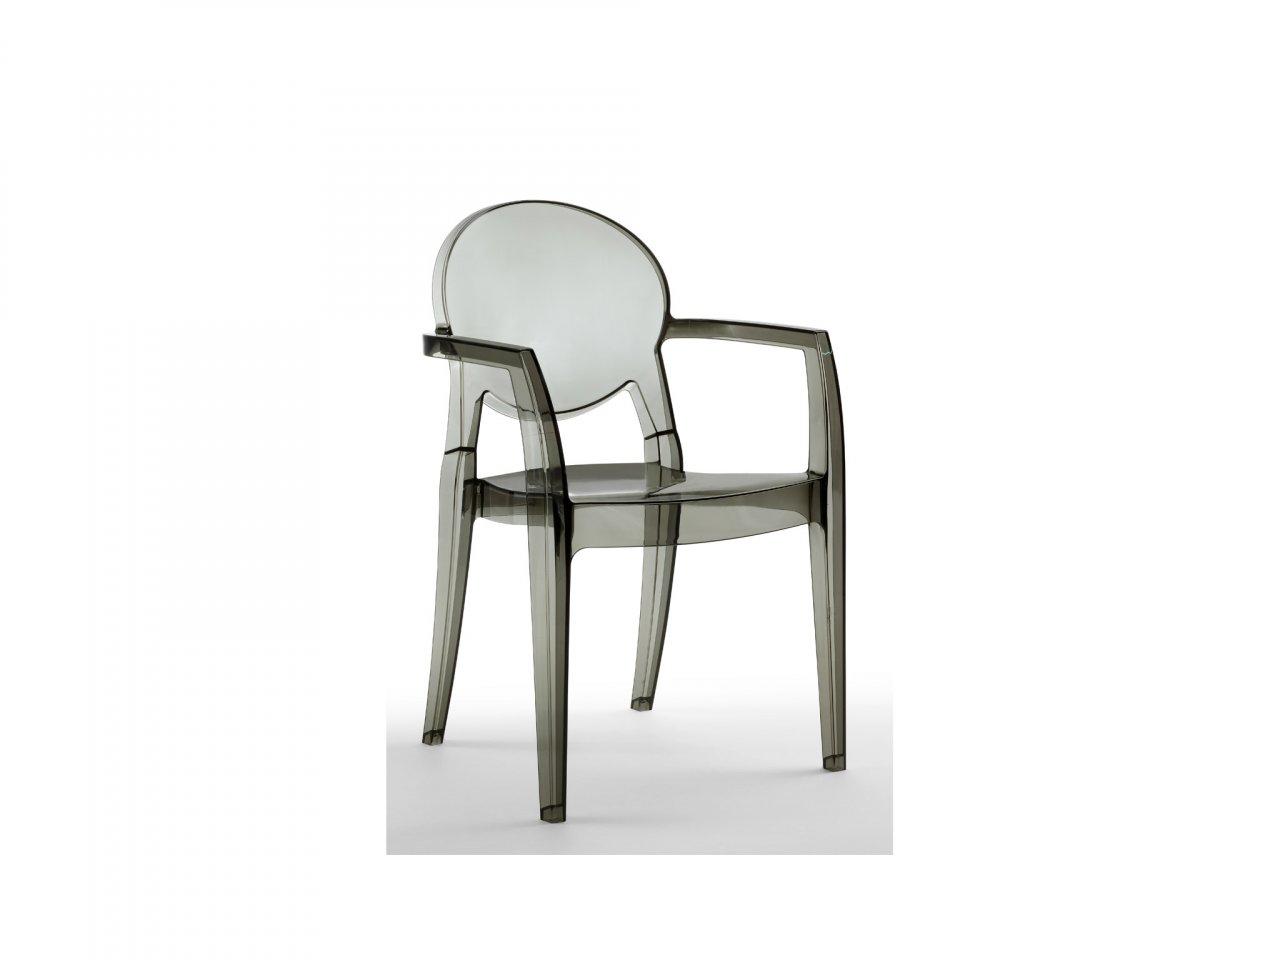 Sedia Con Braccioli Igloo - v4